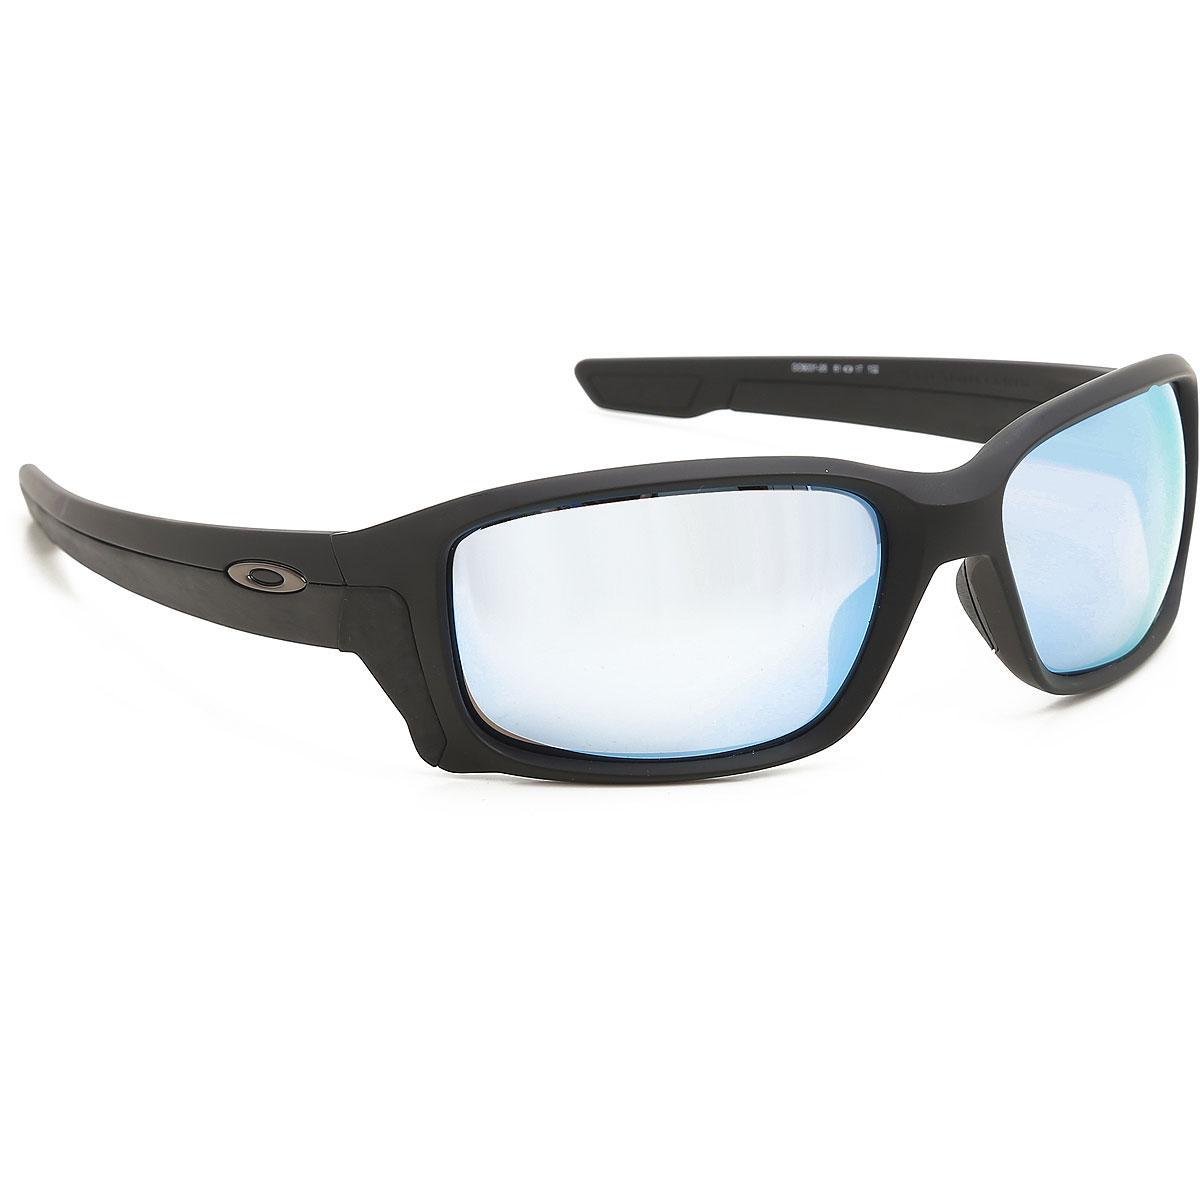 Oakley Sunglasses for Men - Lyst